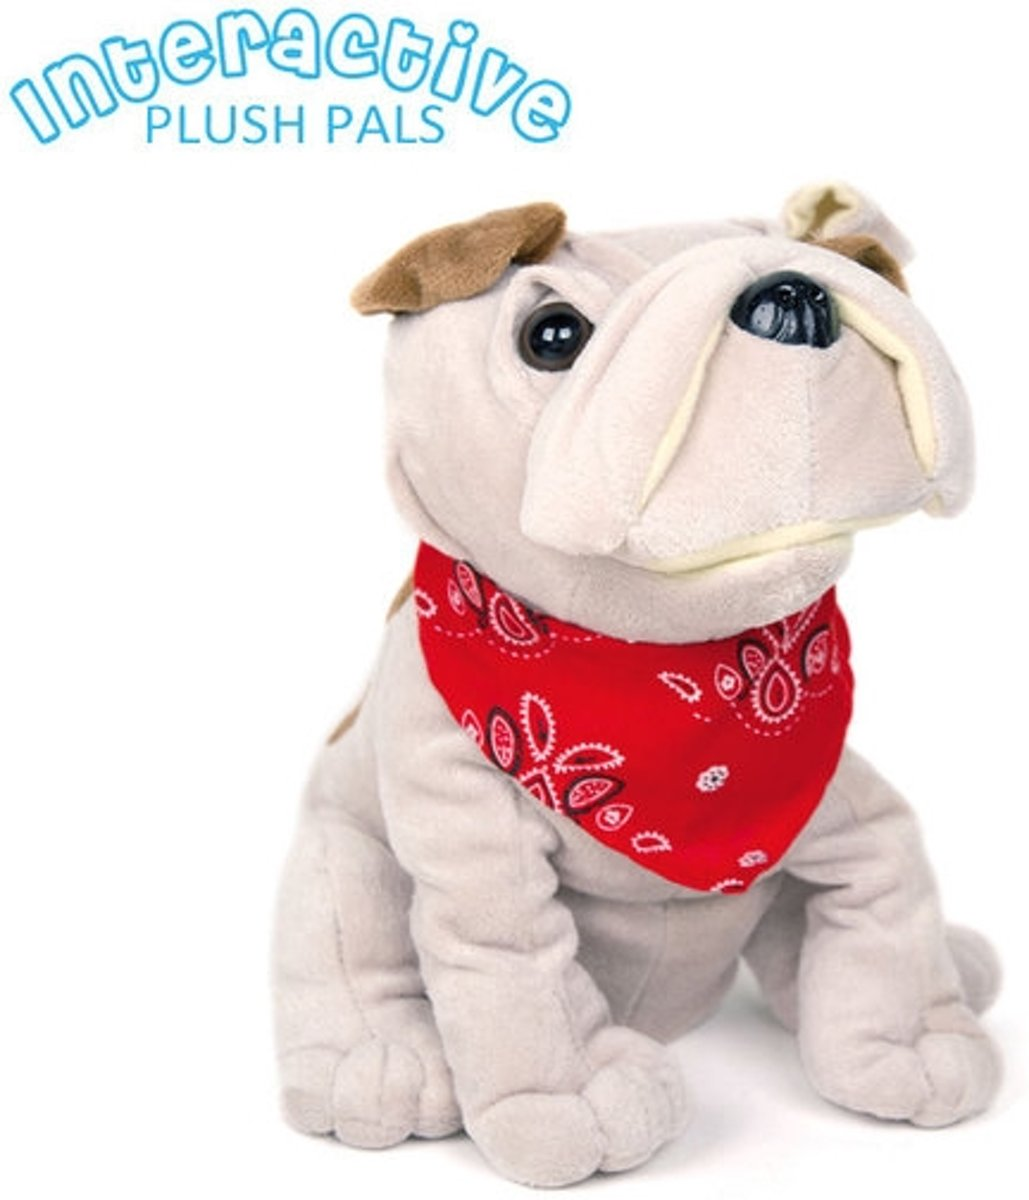 Interactive Plush Pals - Patch (dog)